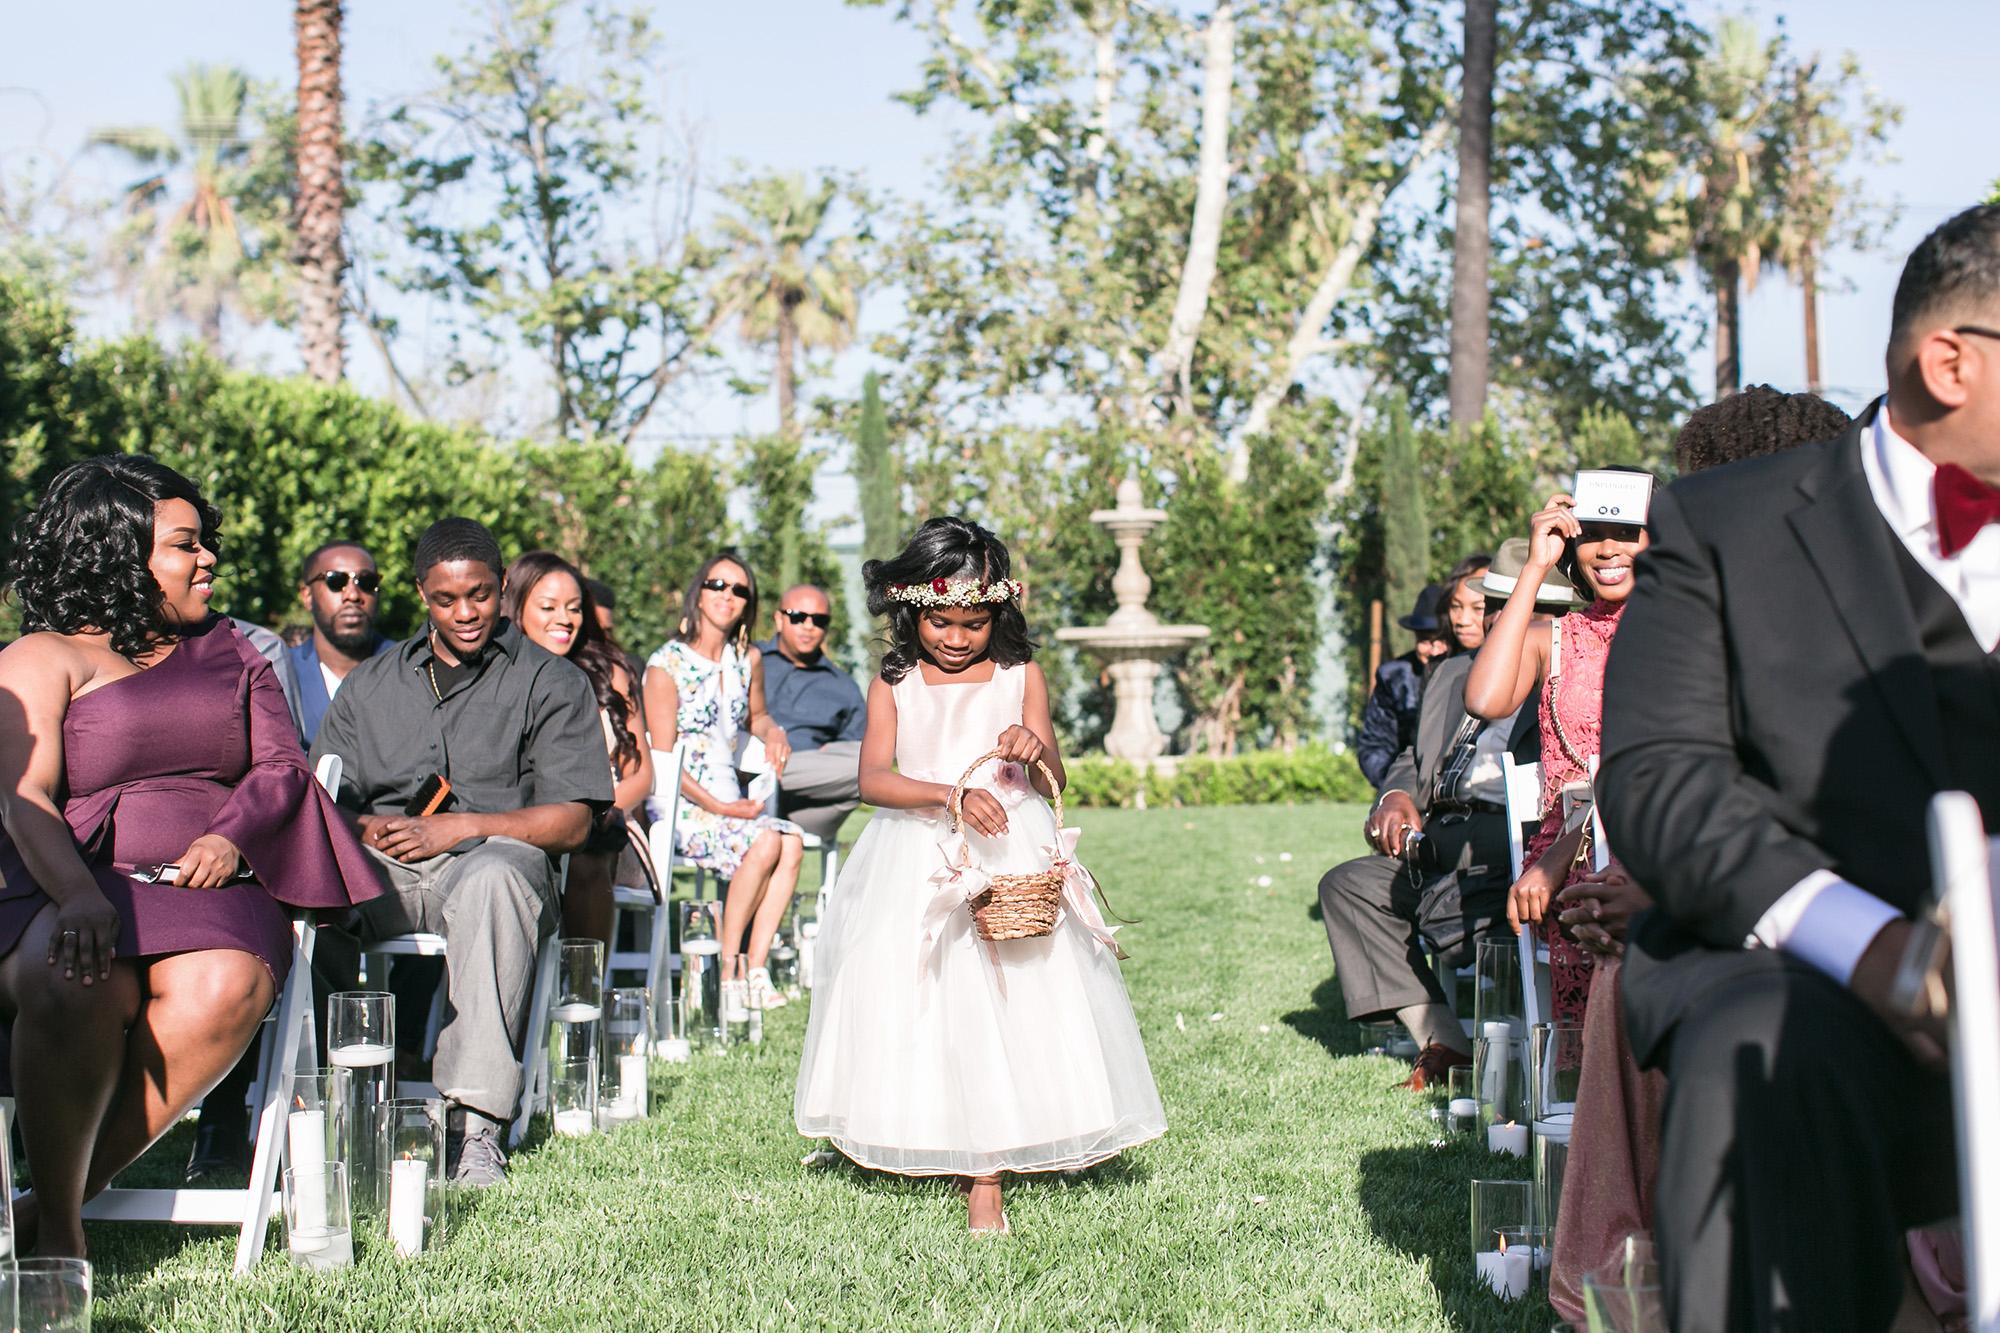 associate-photographer-christmas-house-wedding-carrie-vines-0049.jpg